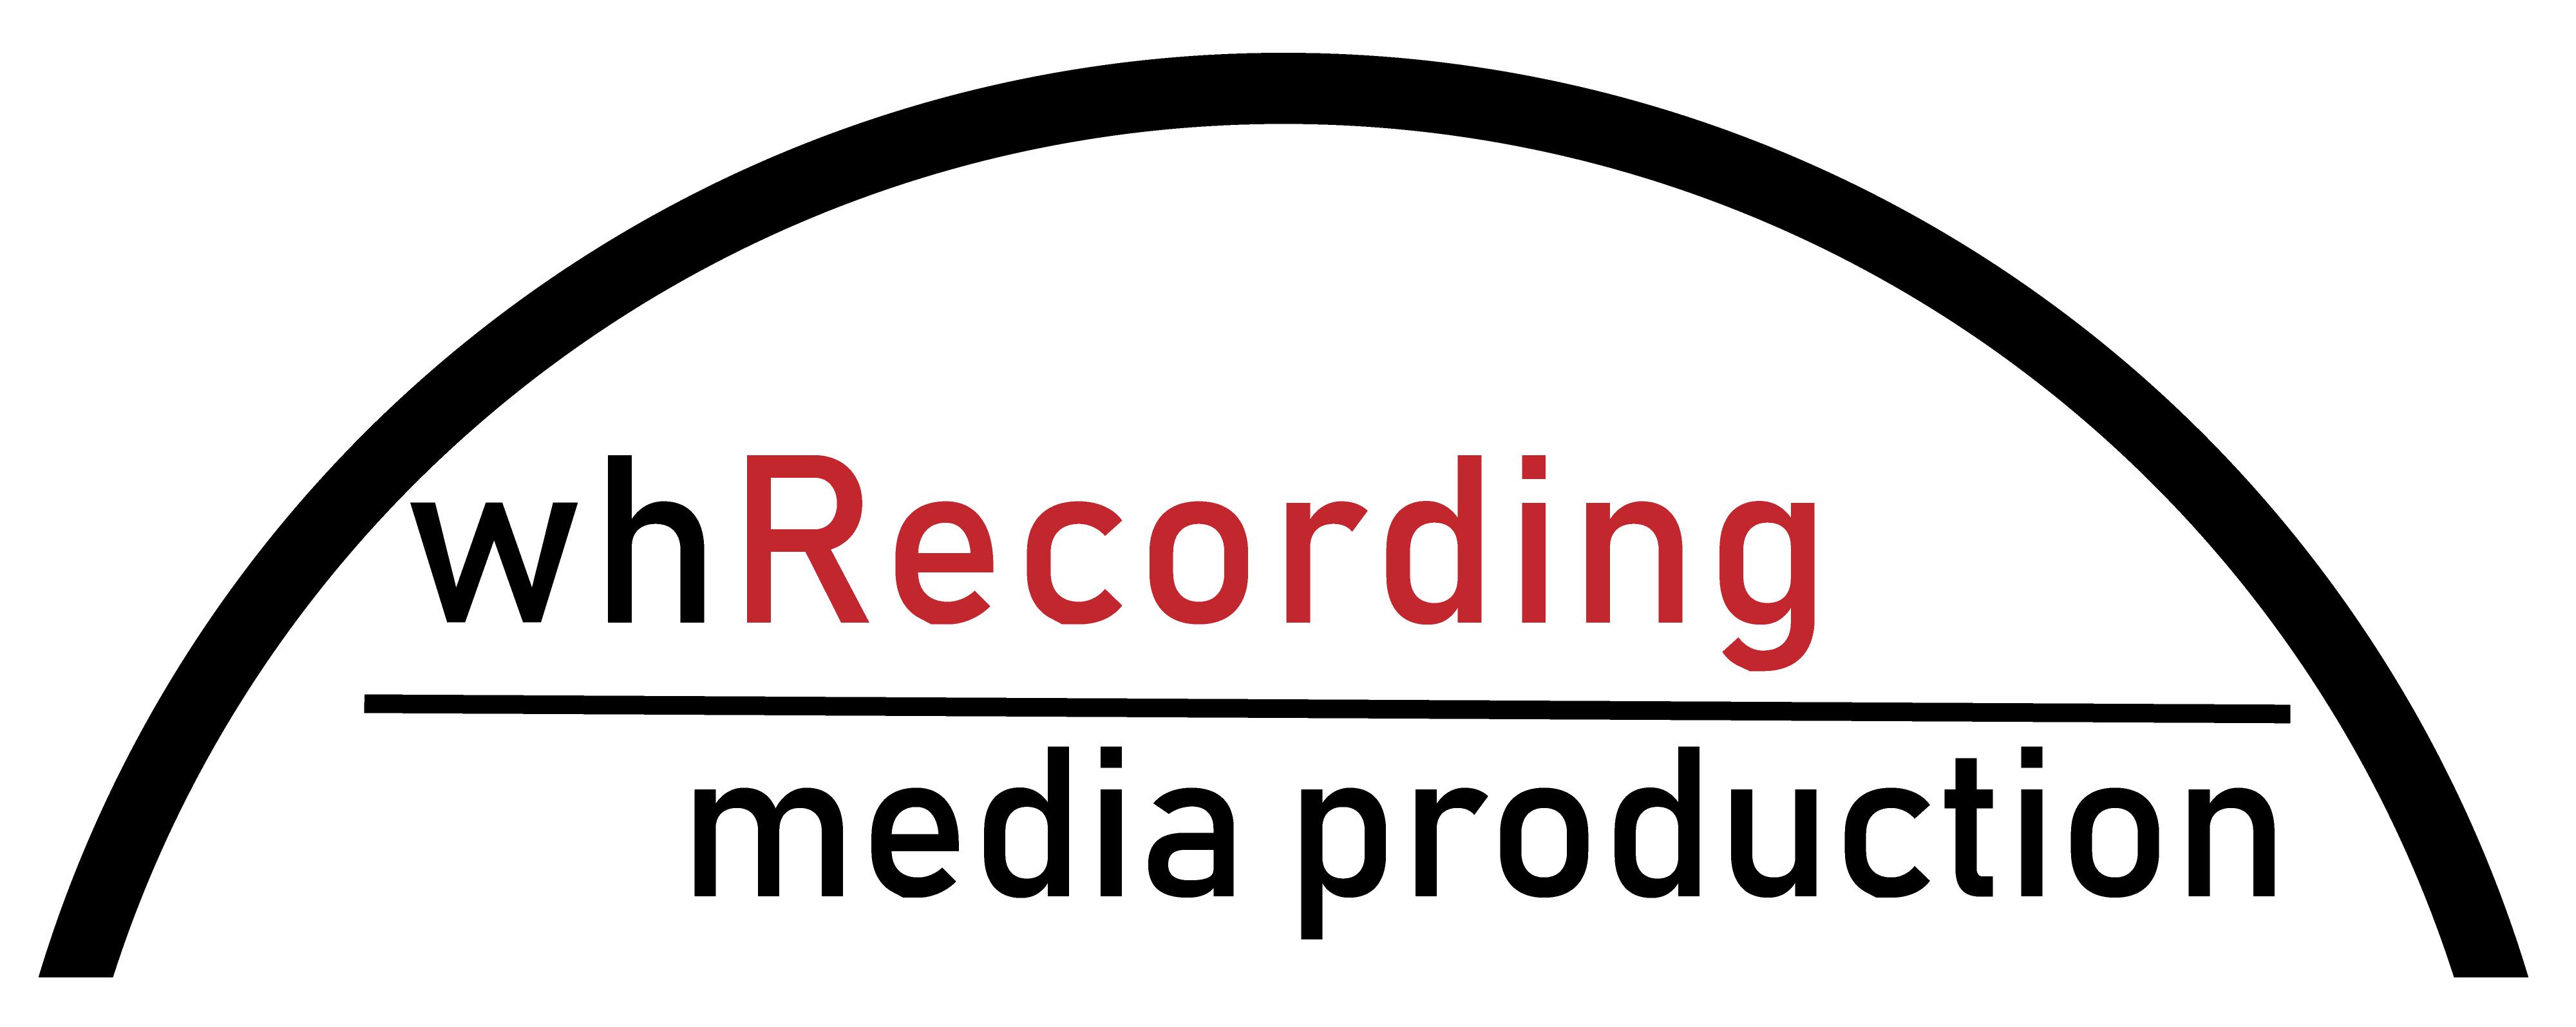 whRecording media production